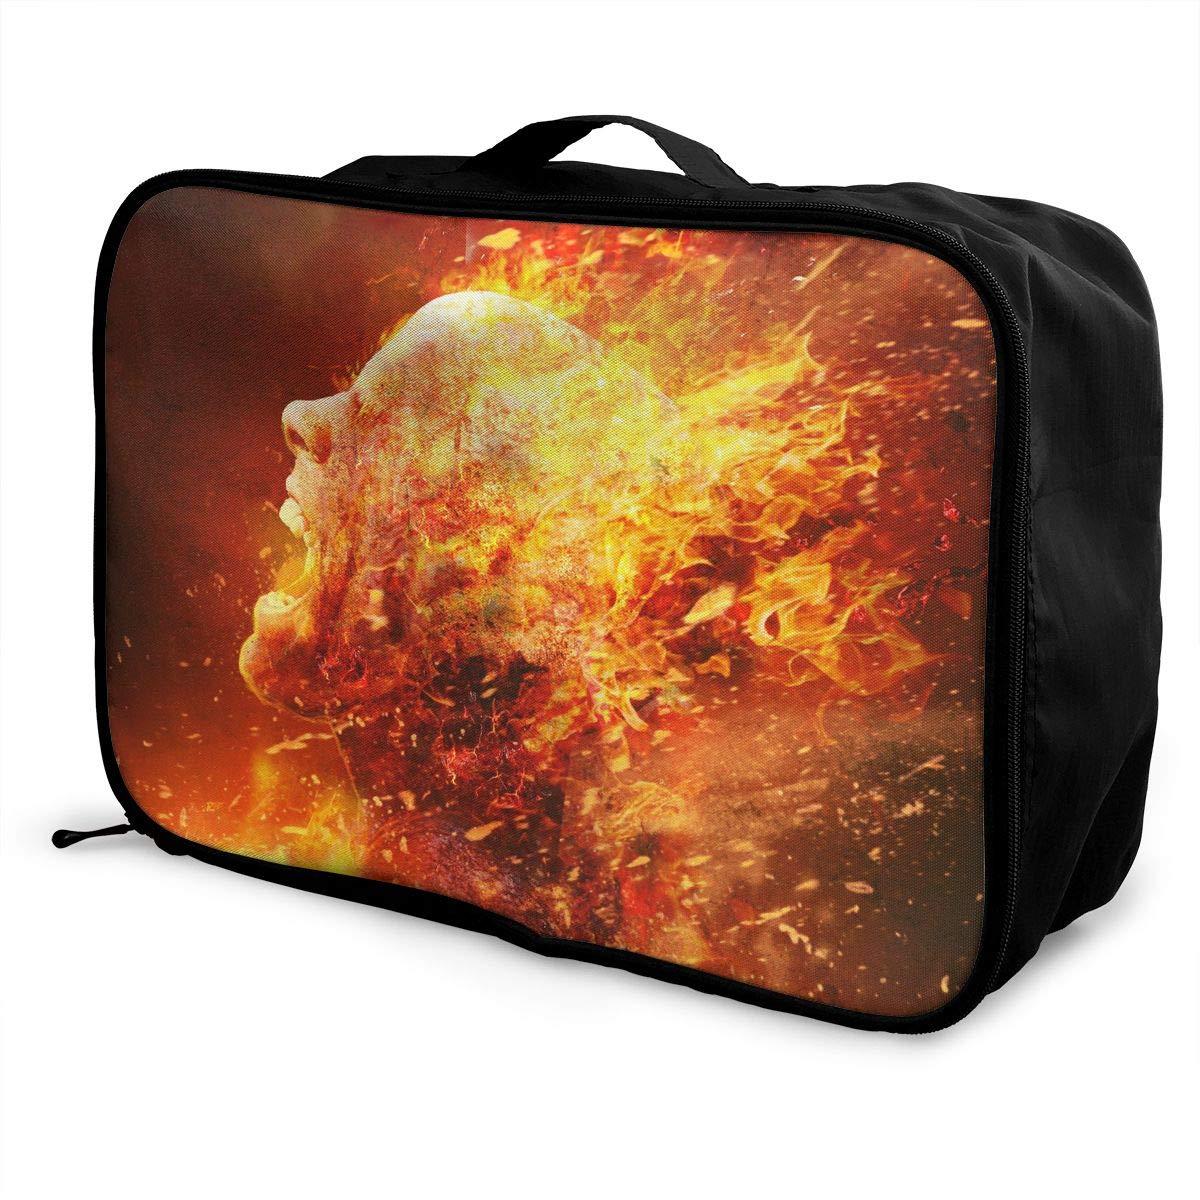 Travel Luggage Duffle Bag Lightweight Portable Handbag Fire Man Large Capacity Waterproof Foldable Storage Tote